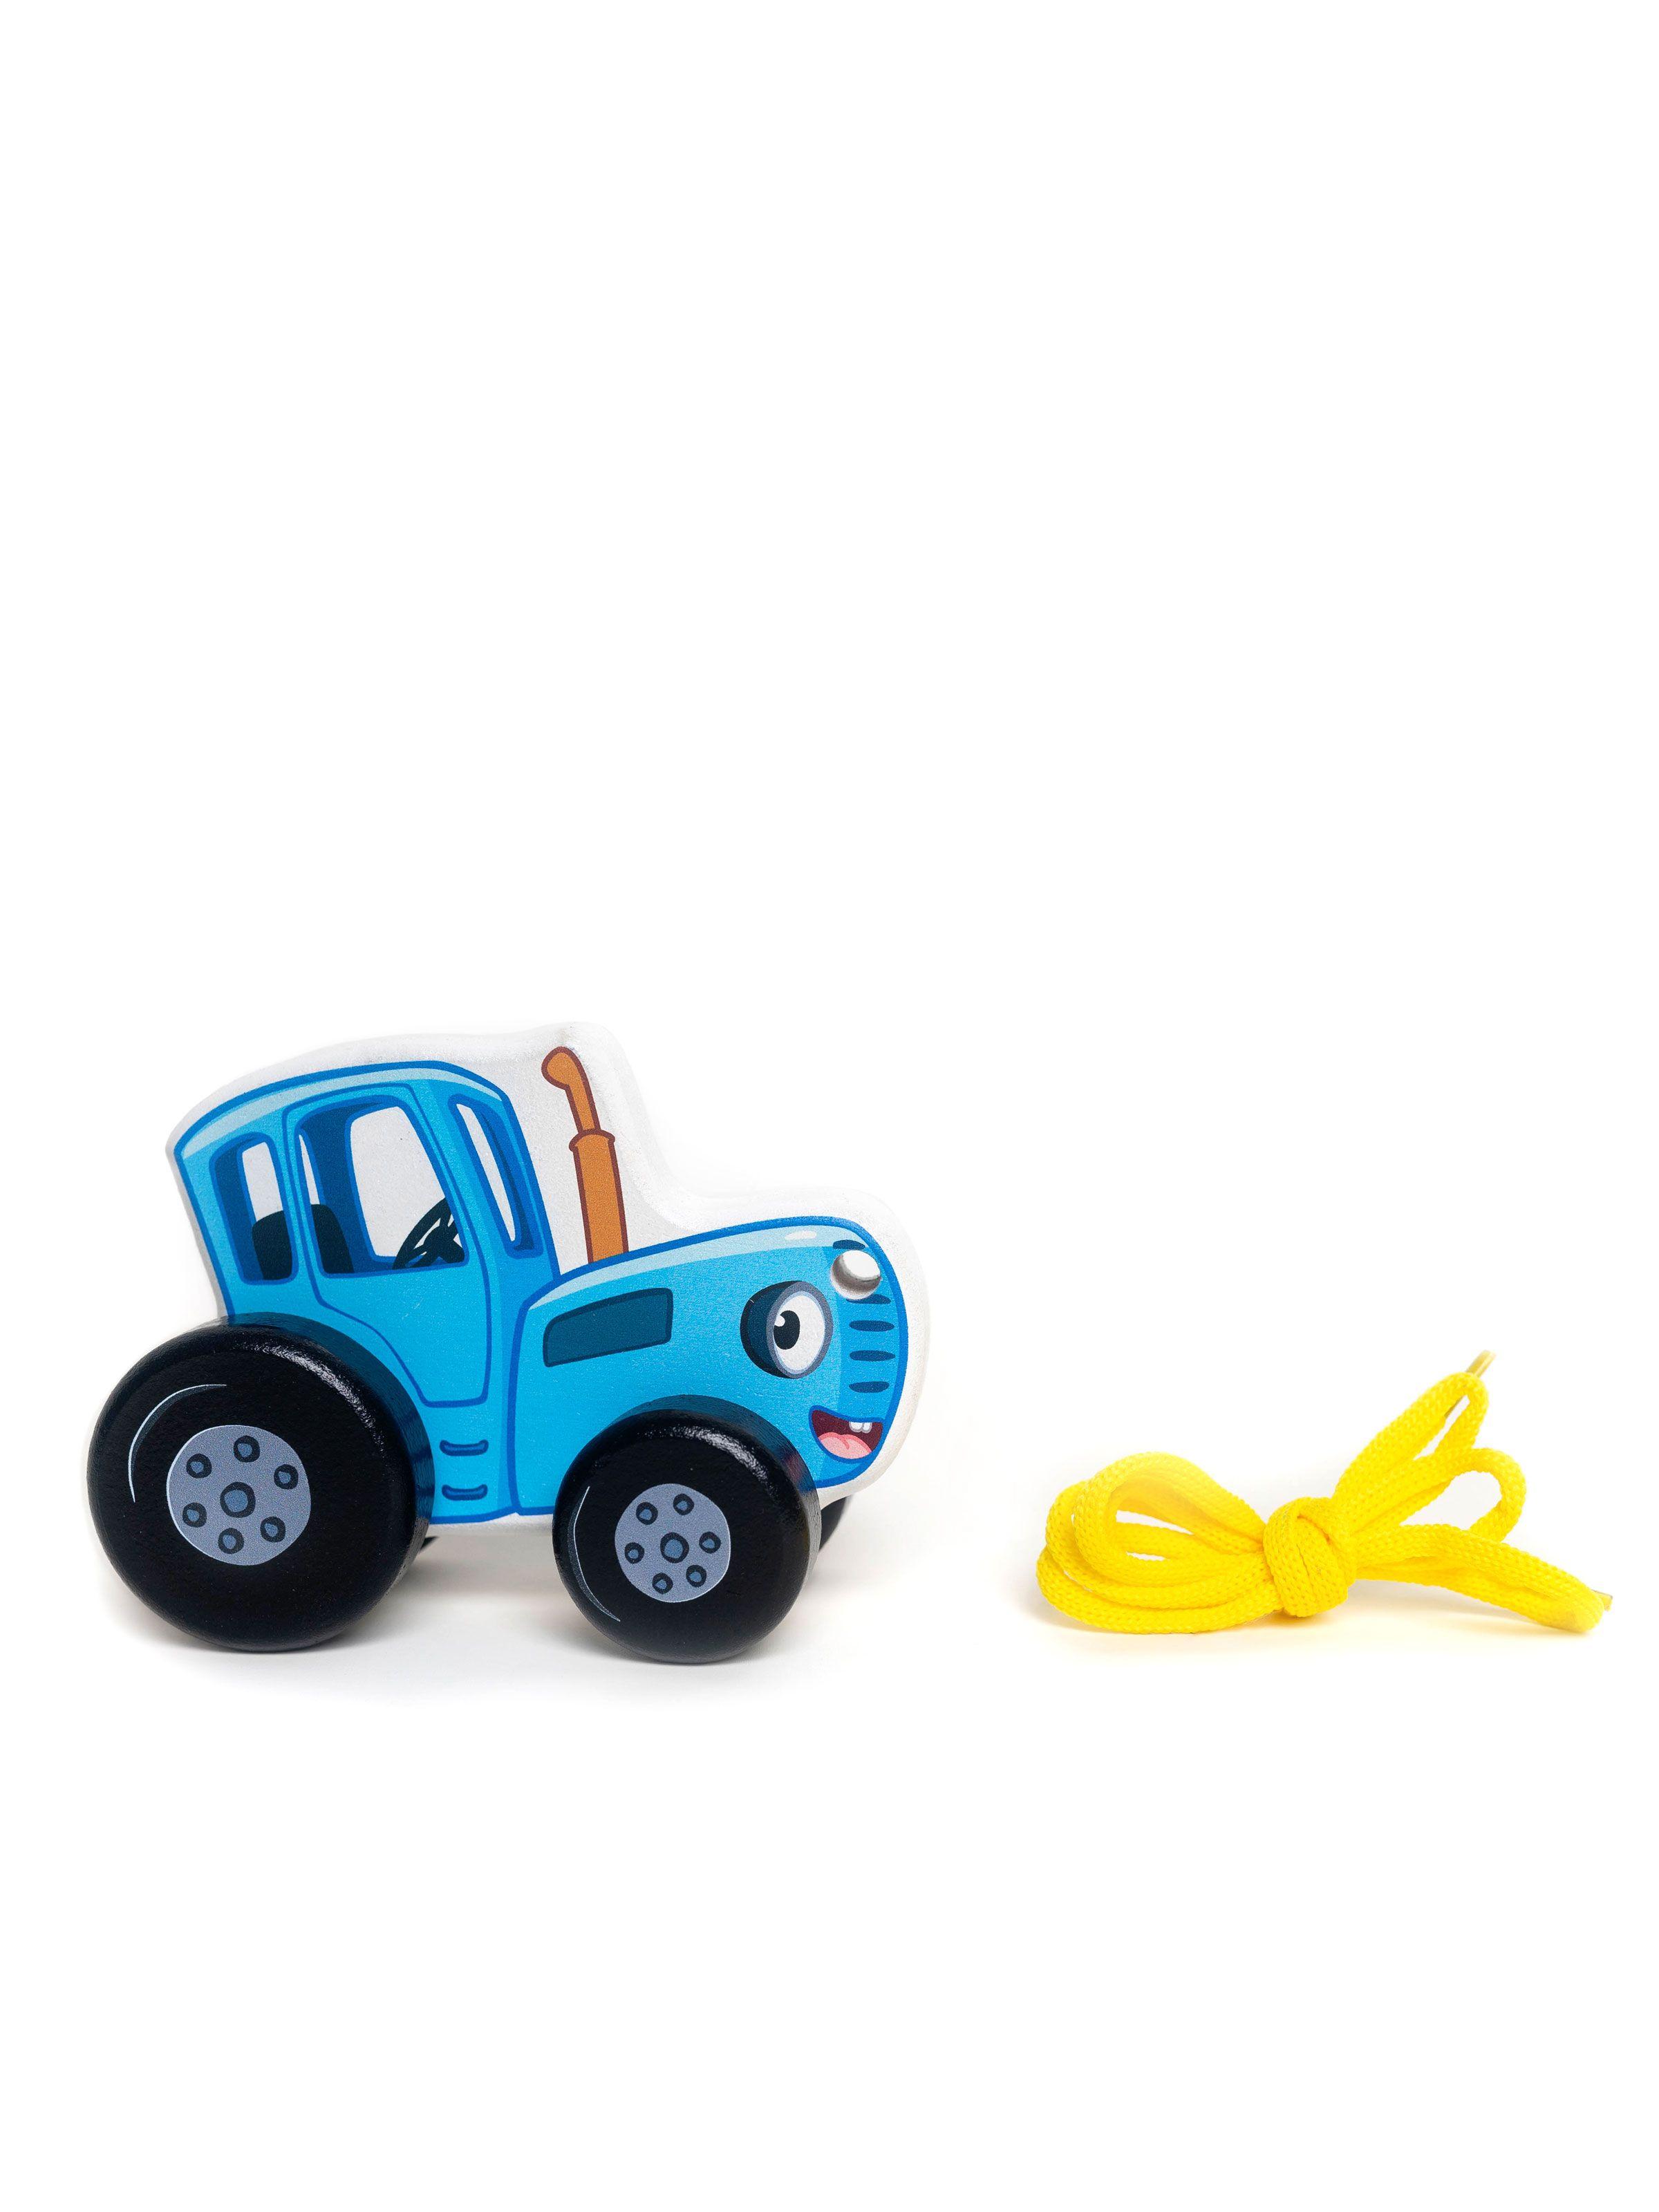 BOCHART / Blue tractor wheelchair